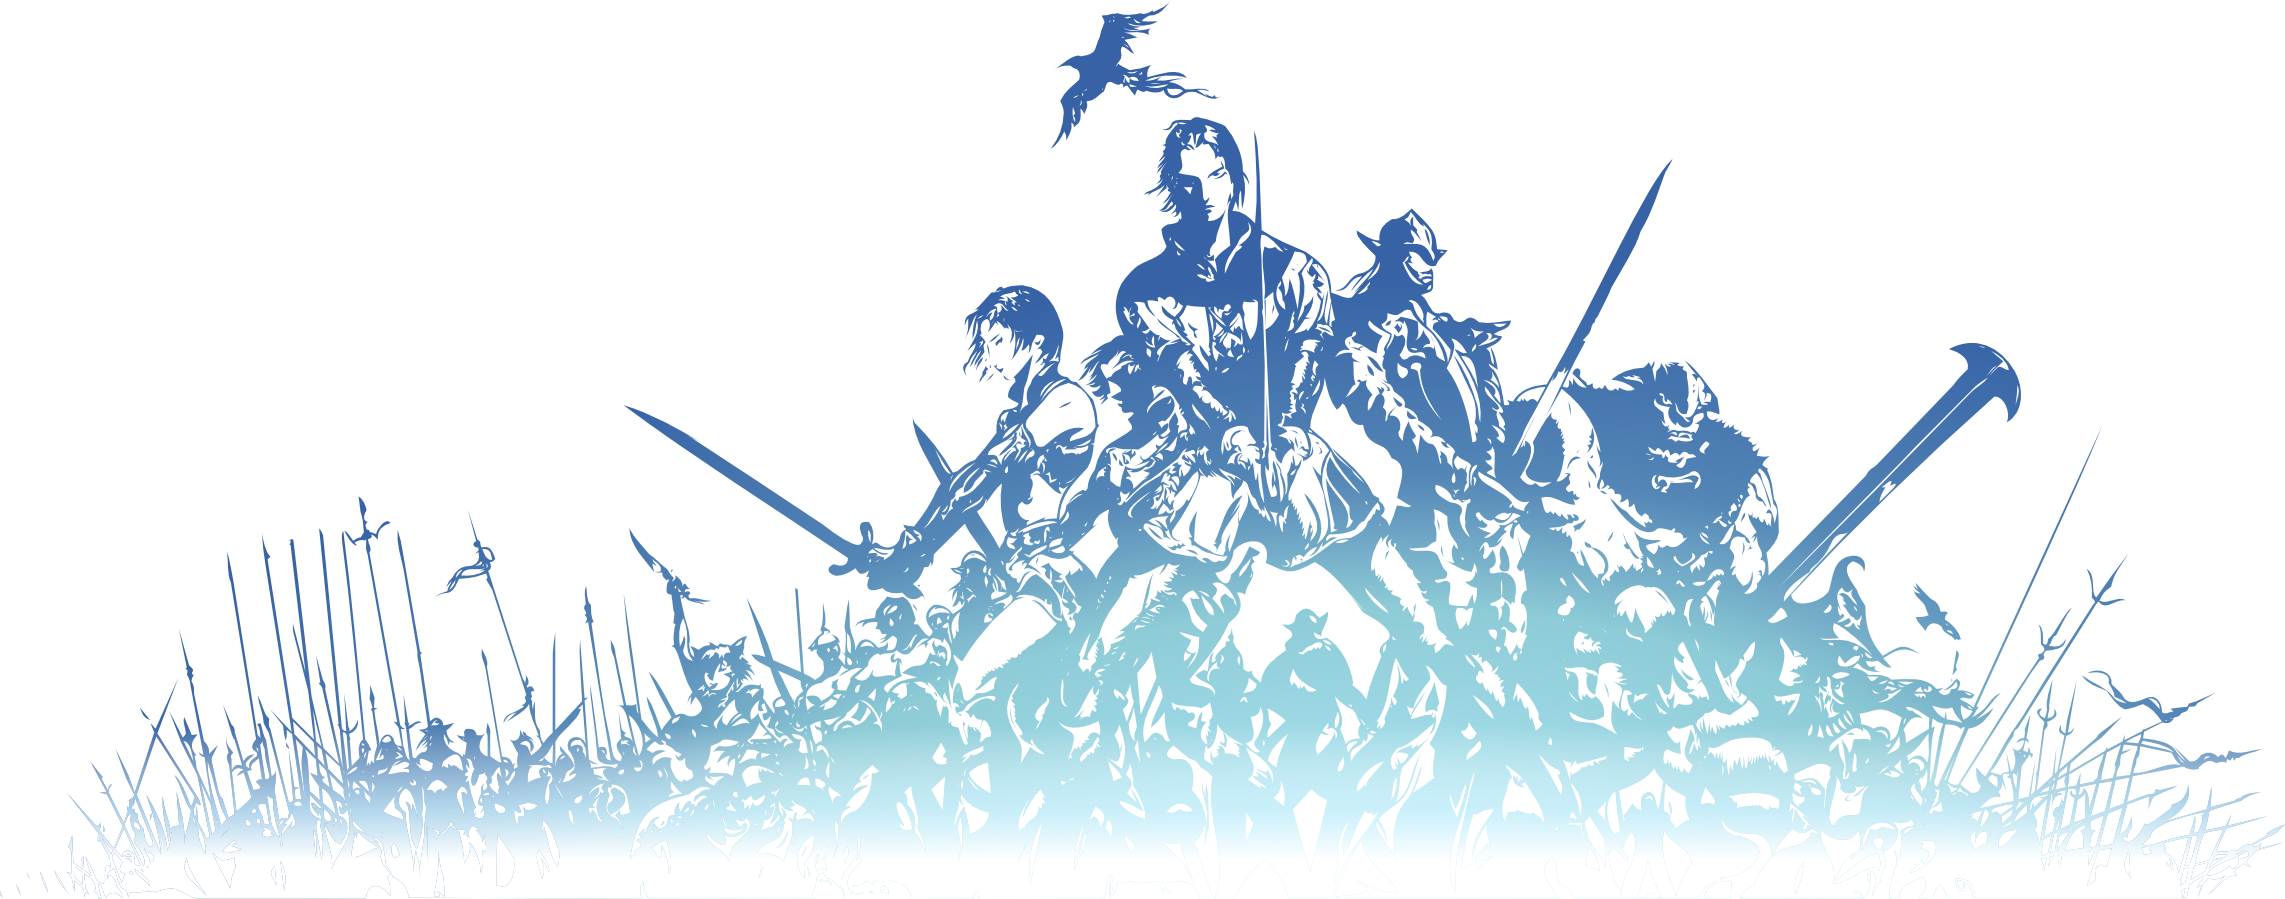 Final Fantasy Xi Unyielding Ring Enhances Resist Charm